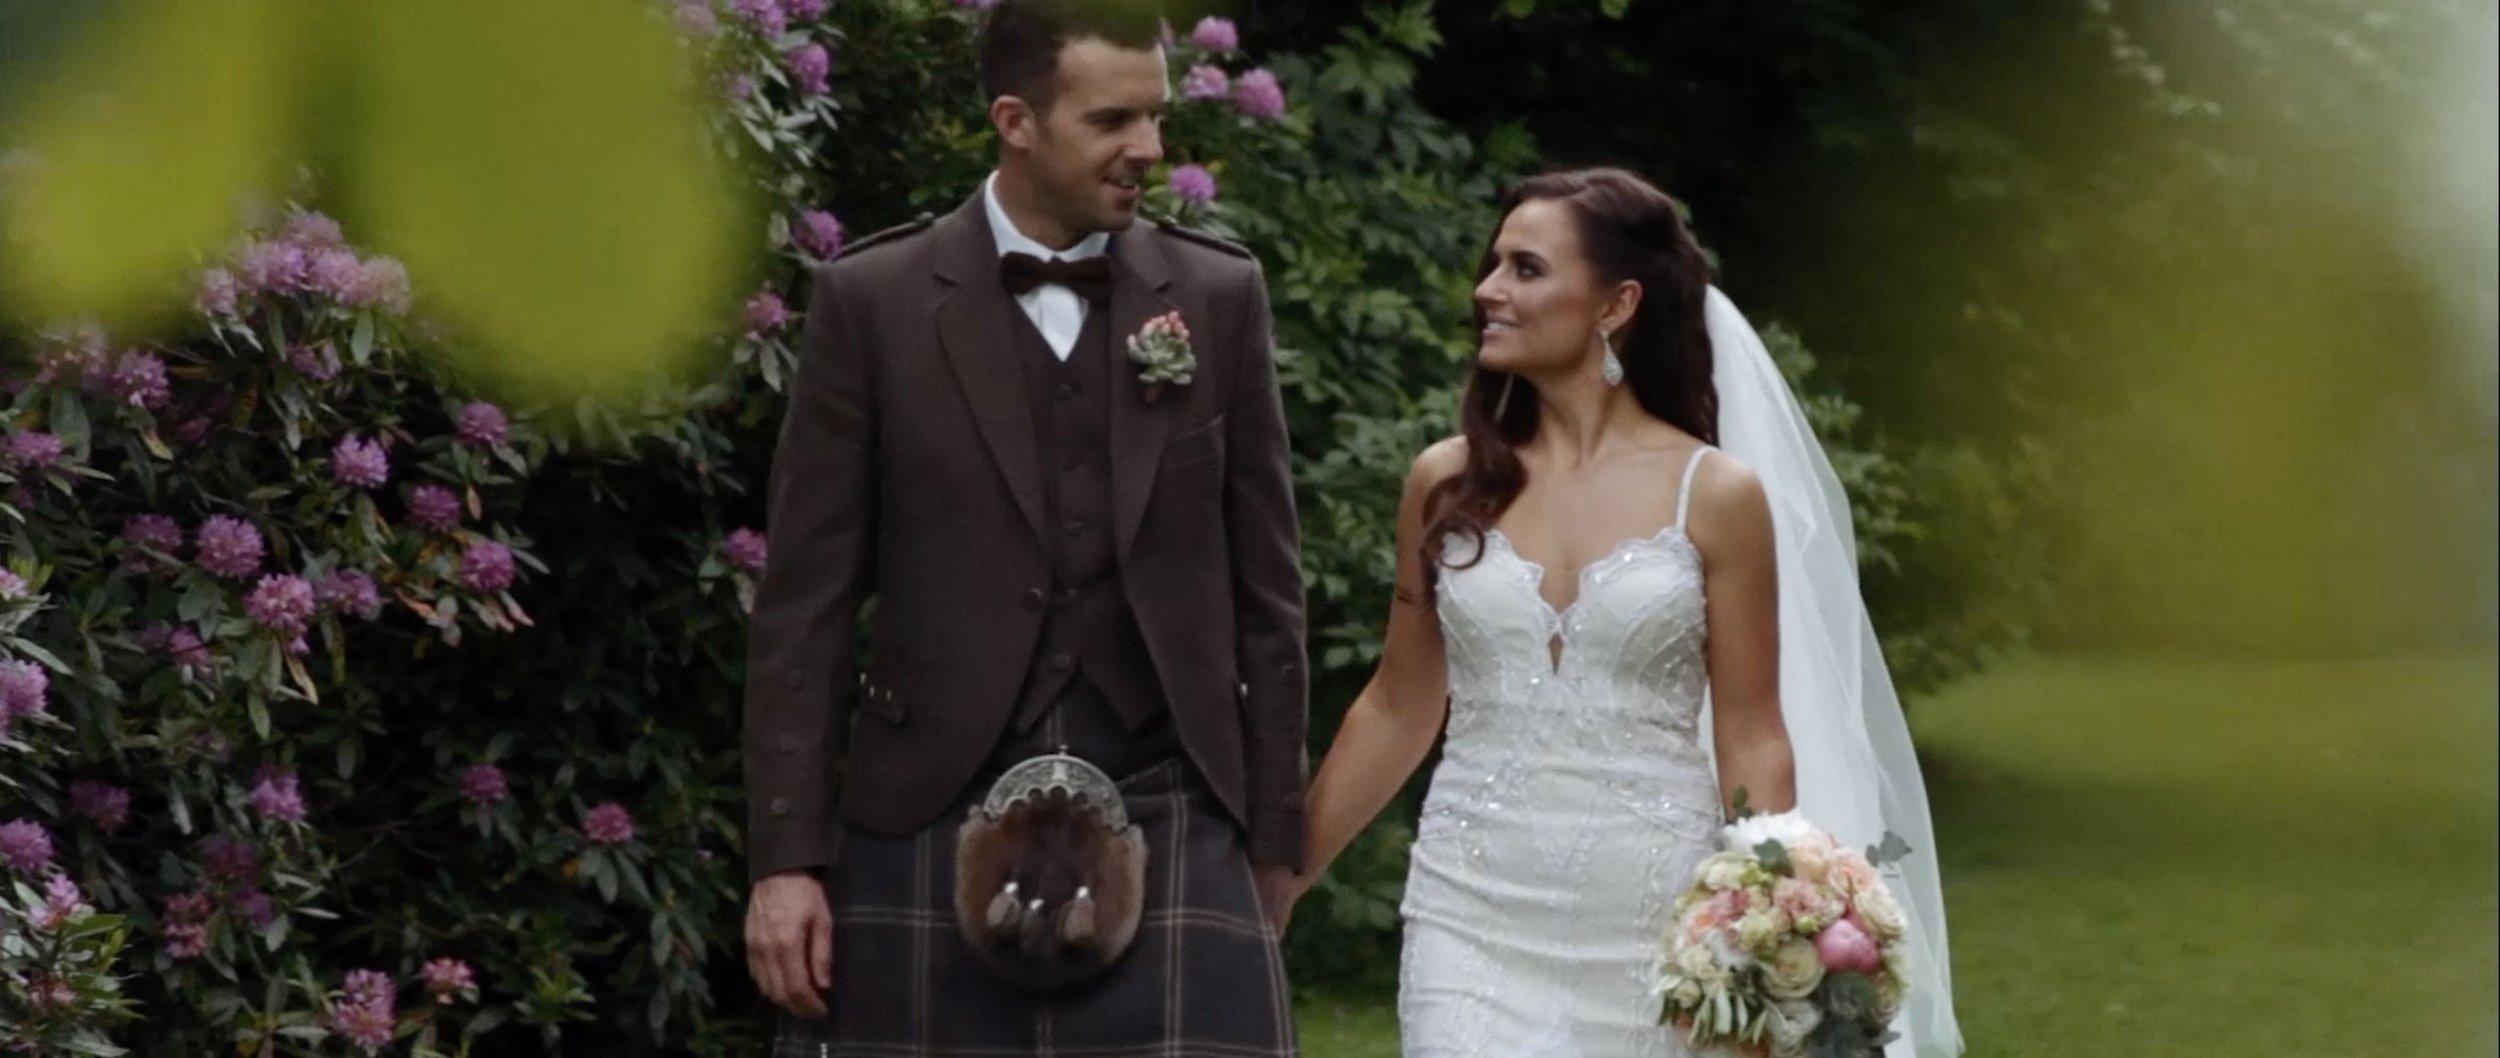 ggs-yard-wedding-videographer_LL_06.jpg